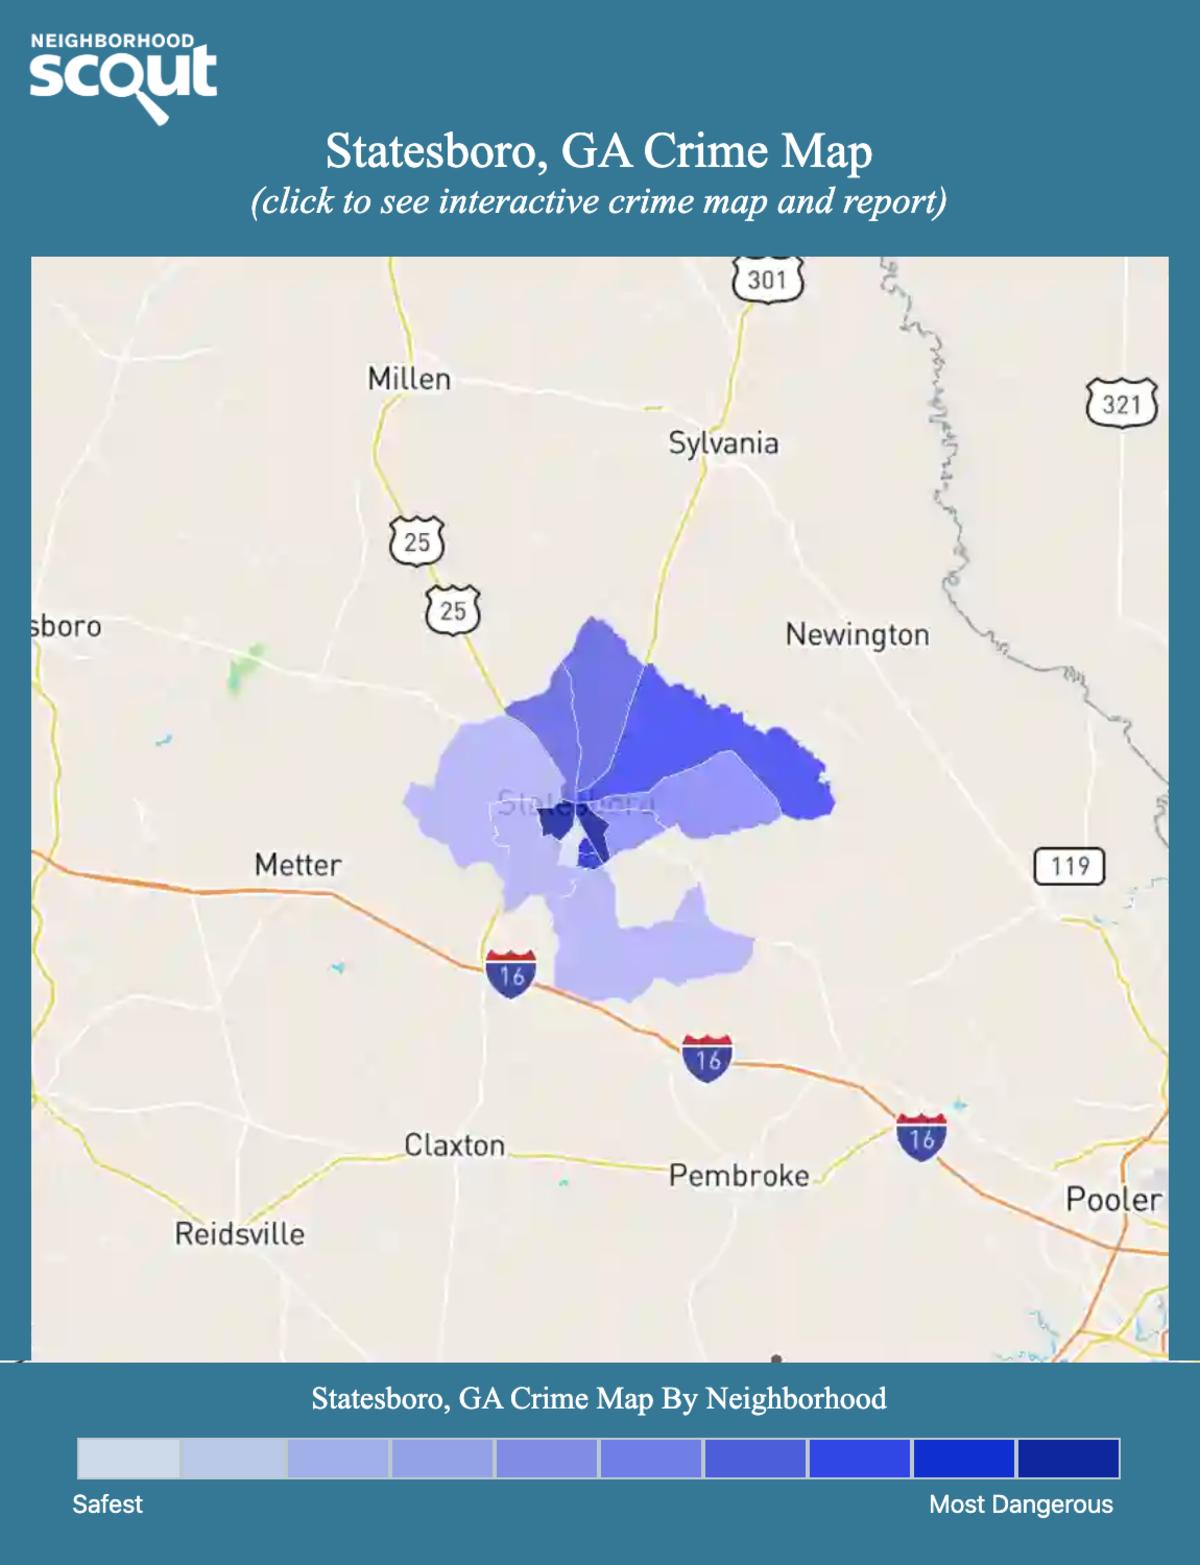 Statesboro, Georgia crime map